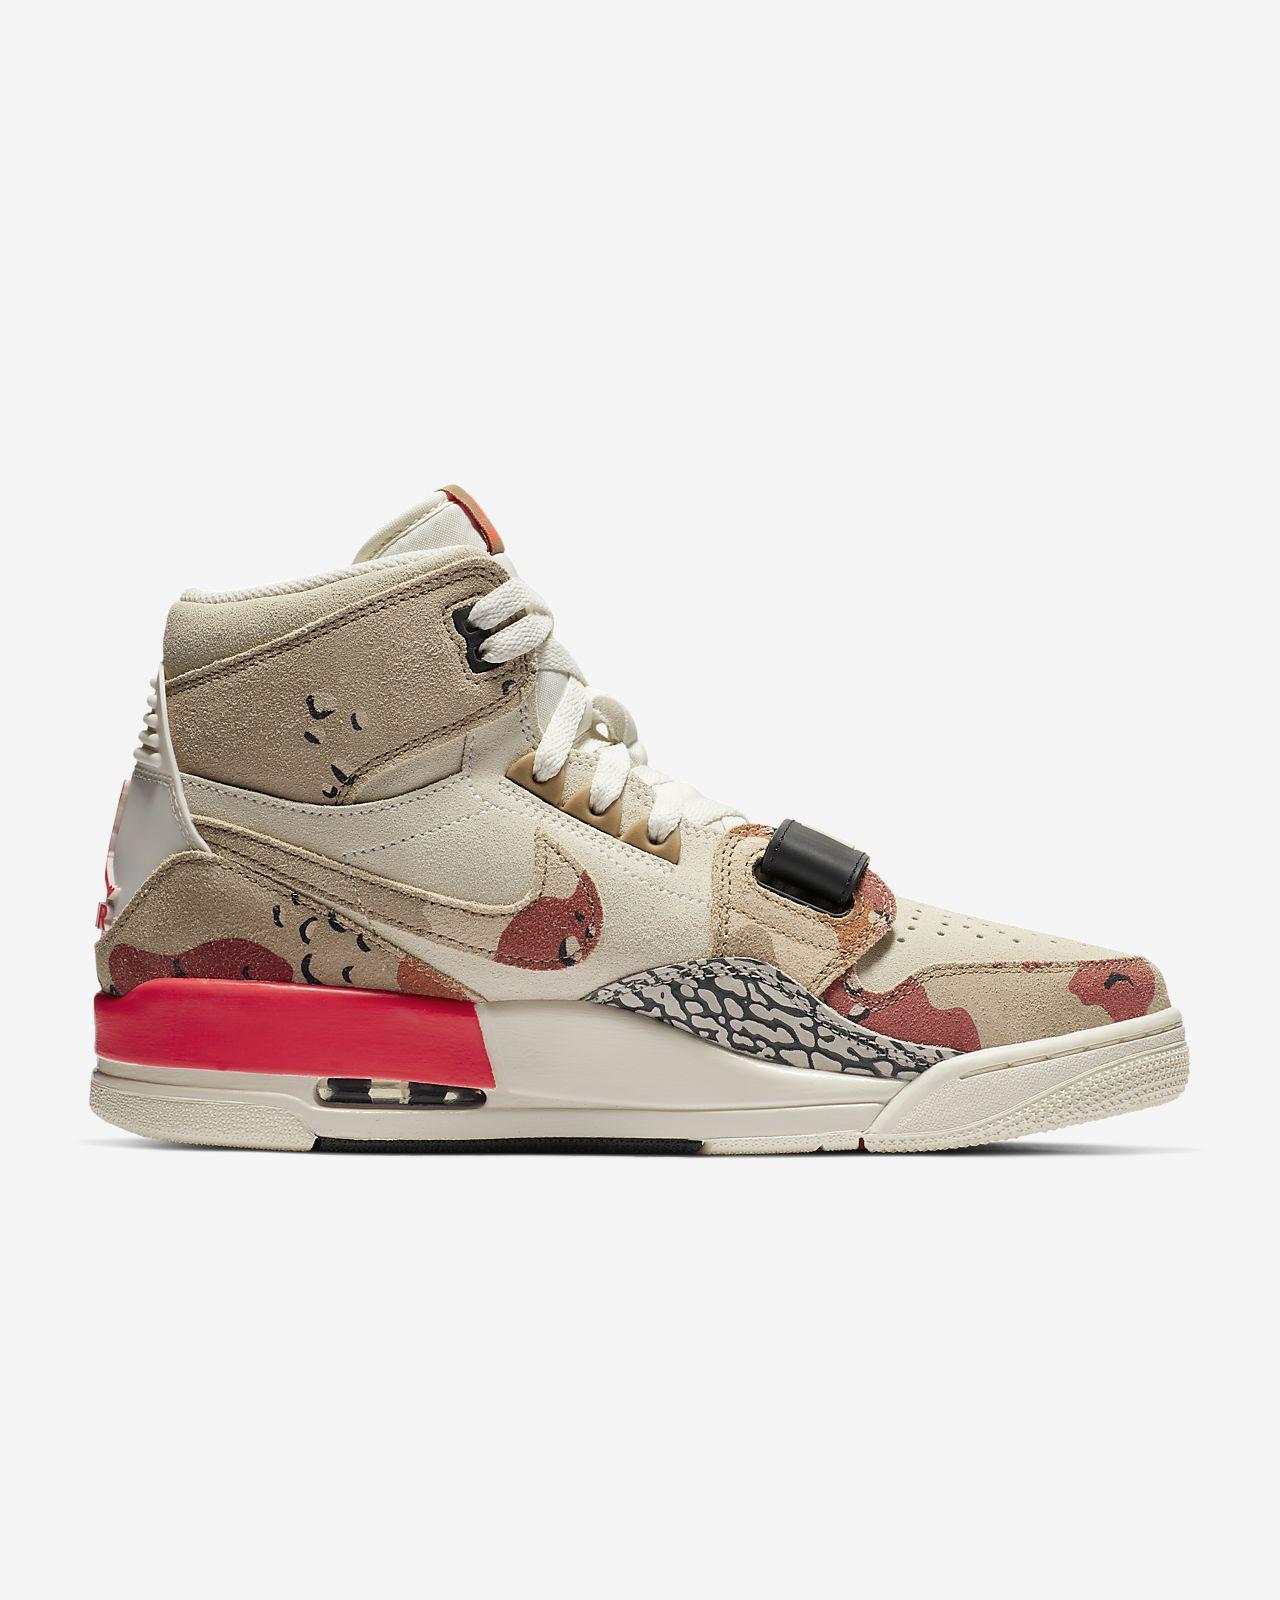 64dbaee431ee Air Jordan Legacy 312 Men s Shoe. Nike.com ID